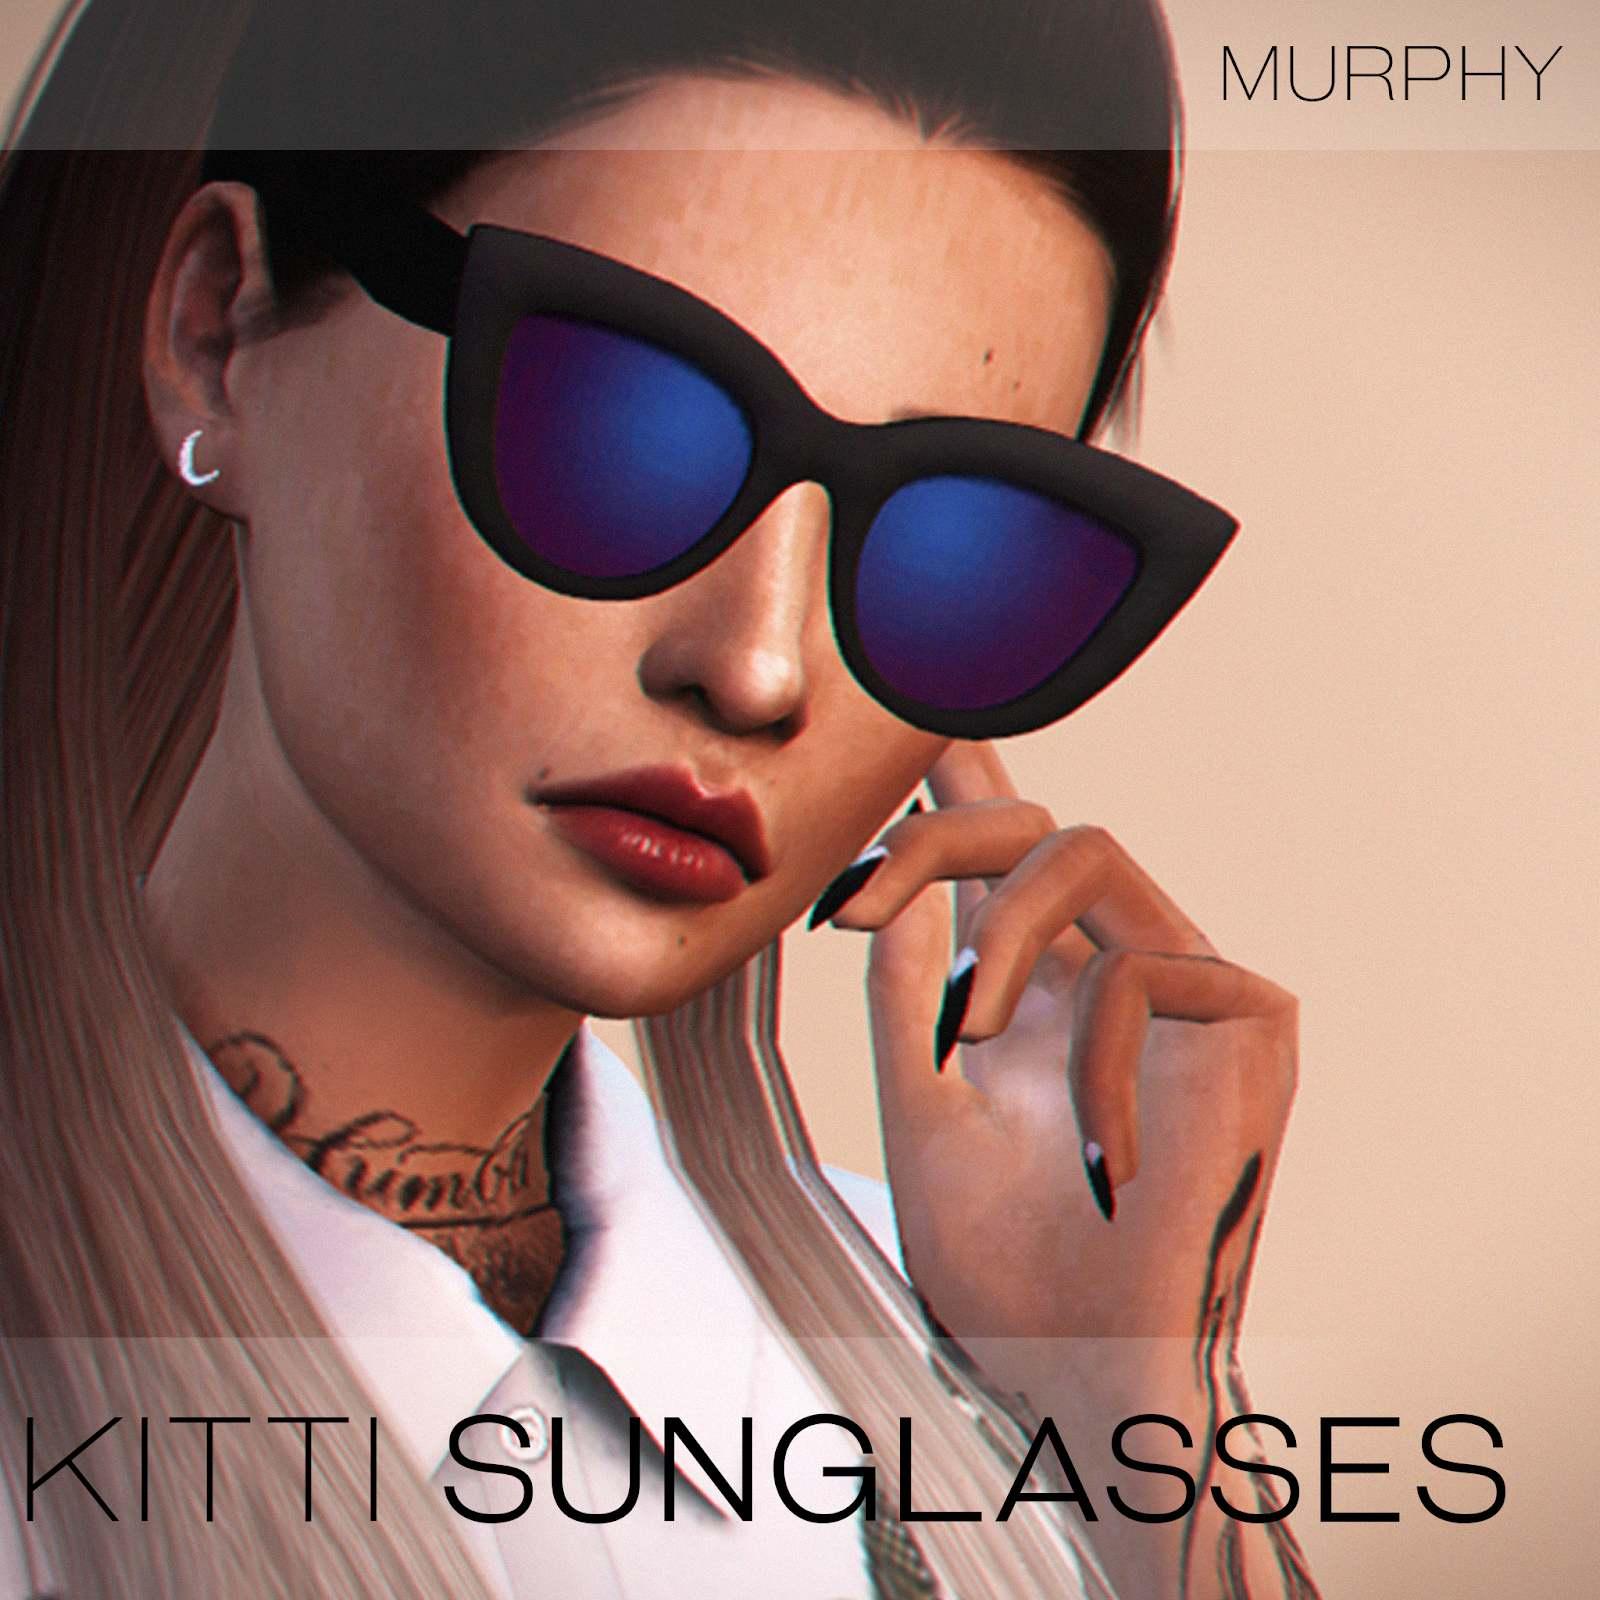 Очки - Kitti Sunglasses